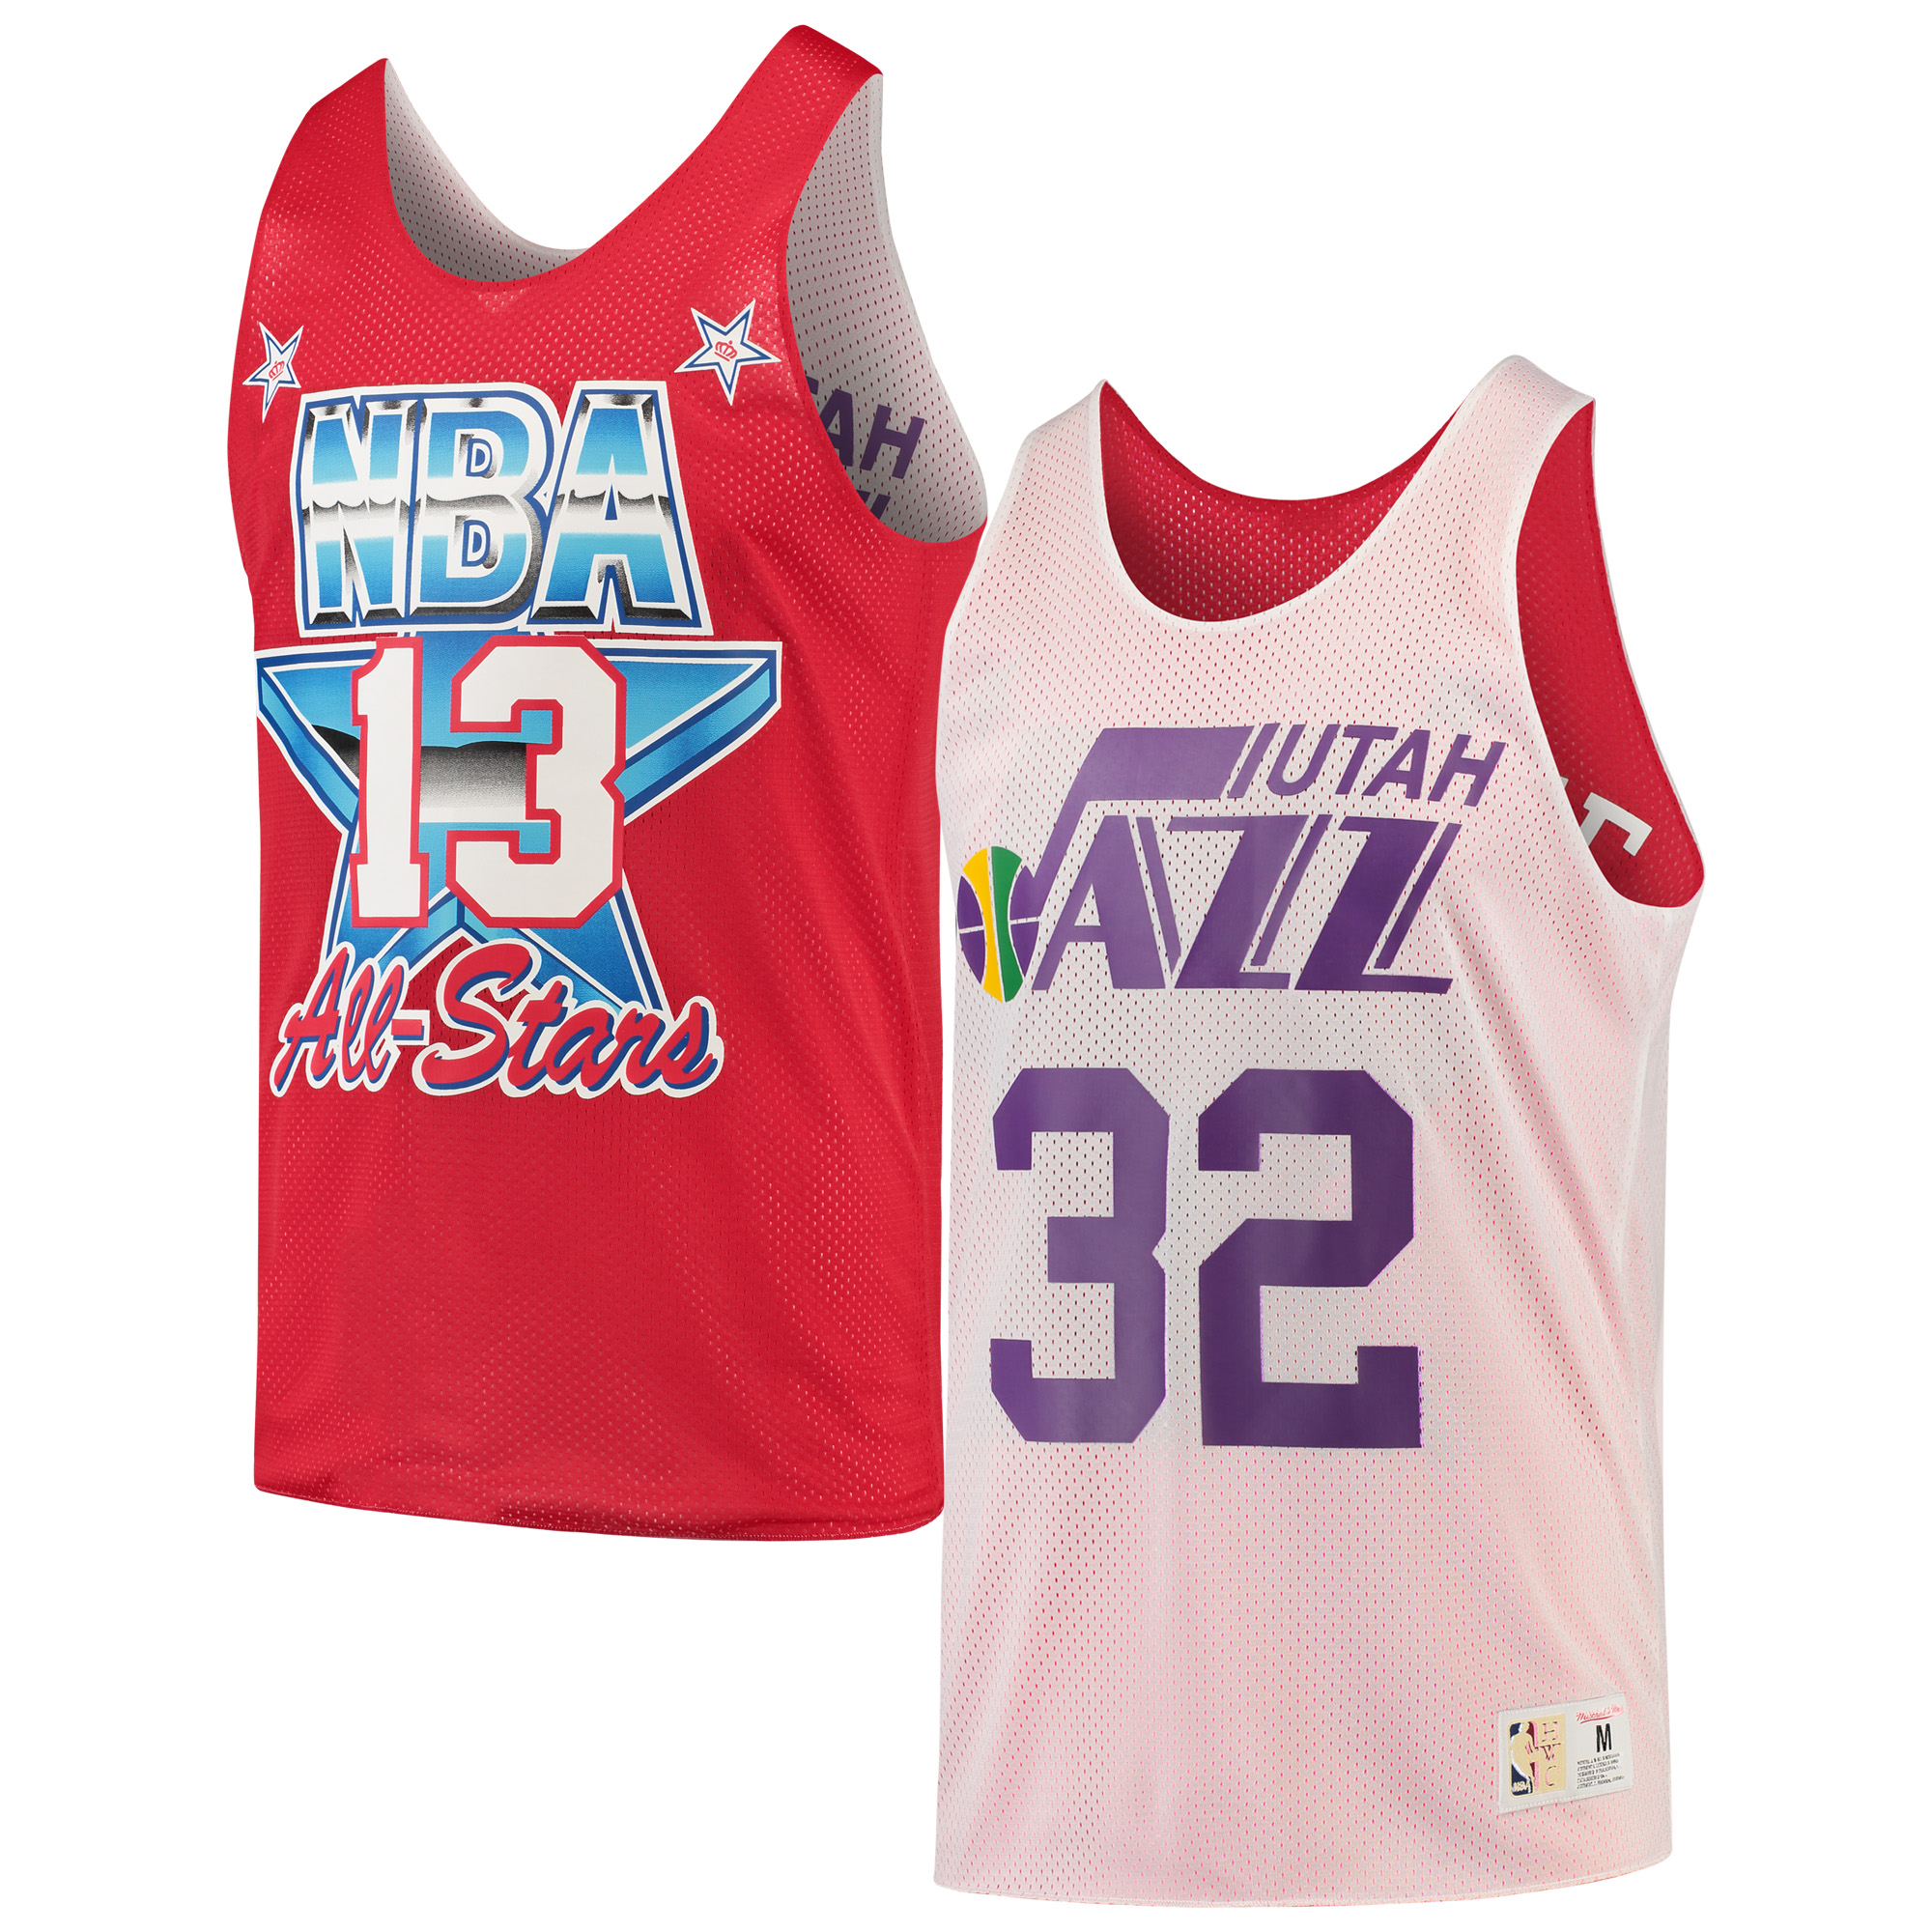 Karl Malone Utah Jazz Mitchell & Ness All-Star Game Reversible Mesh Tank Top - White/Red